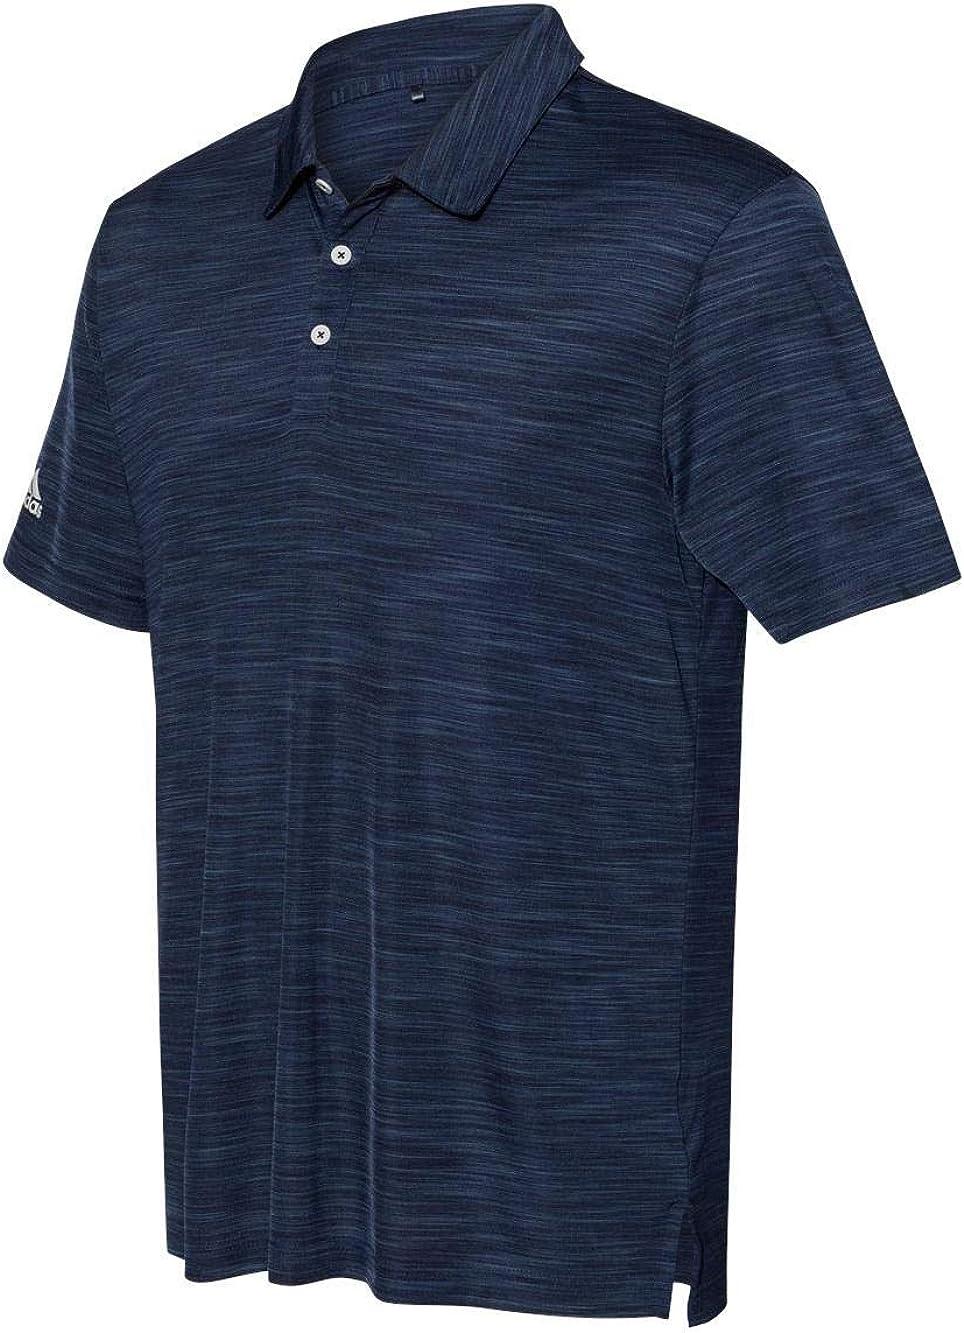 Low price adidas Mens Melange Baltimore Mall Sport Shirt -3XL -Collegiate A402